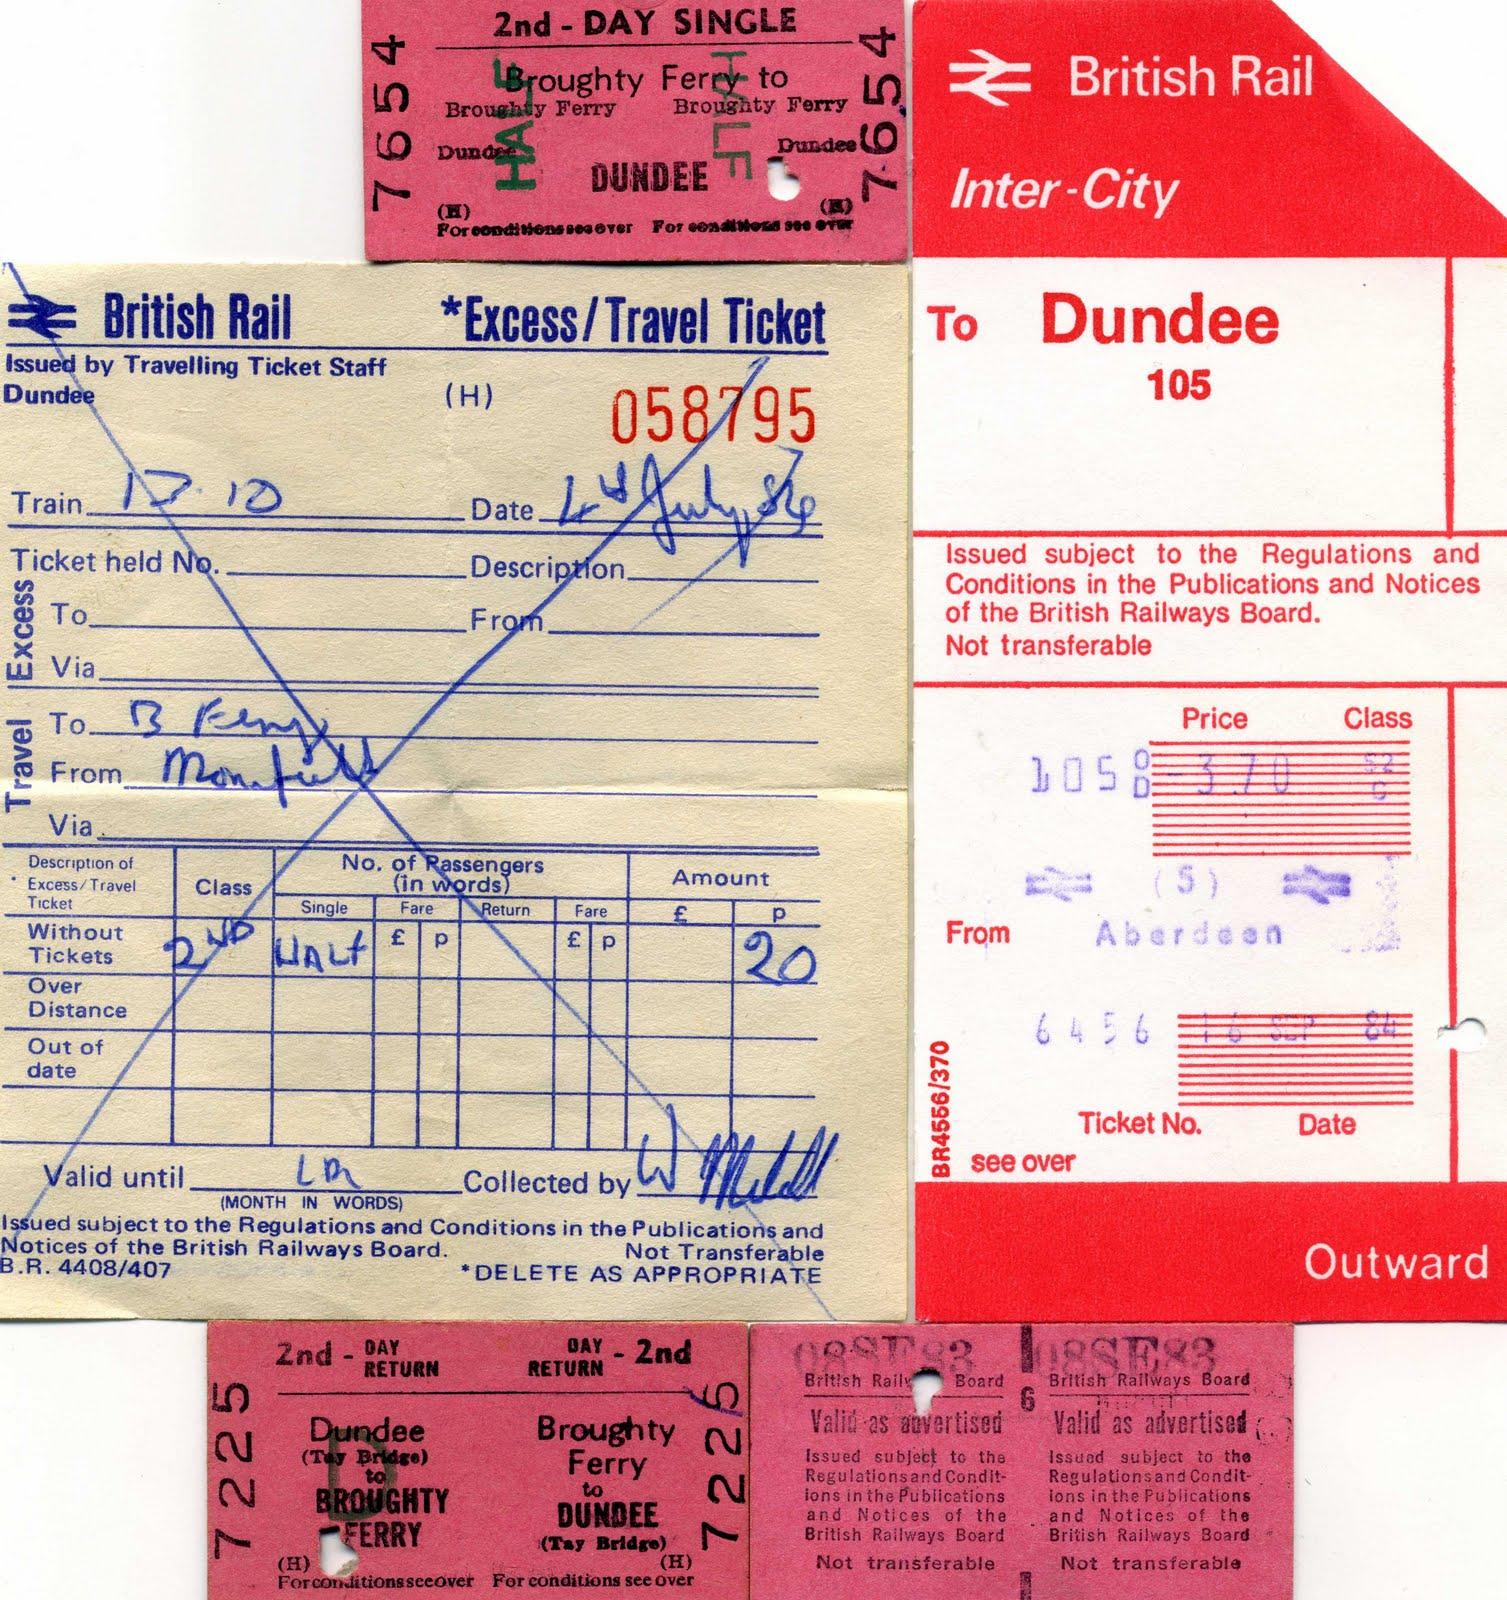 Connecticut Standard State Travel Regulations